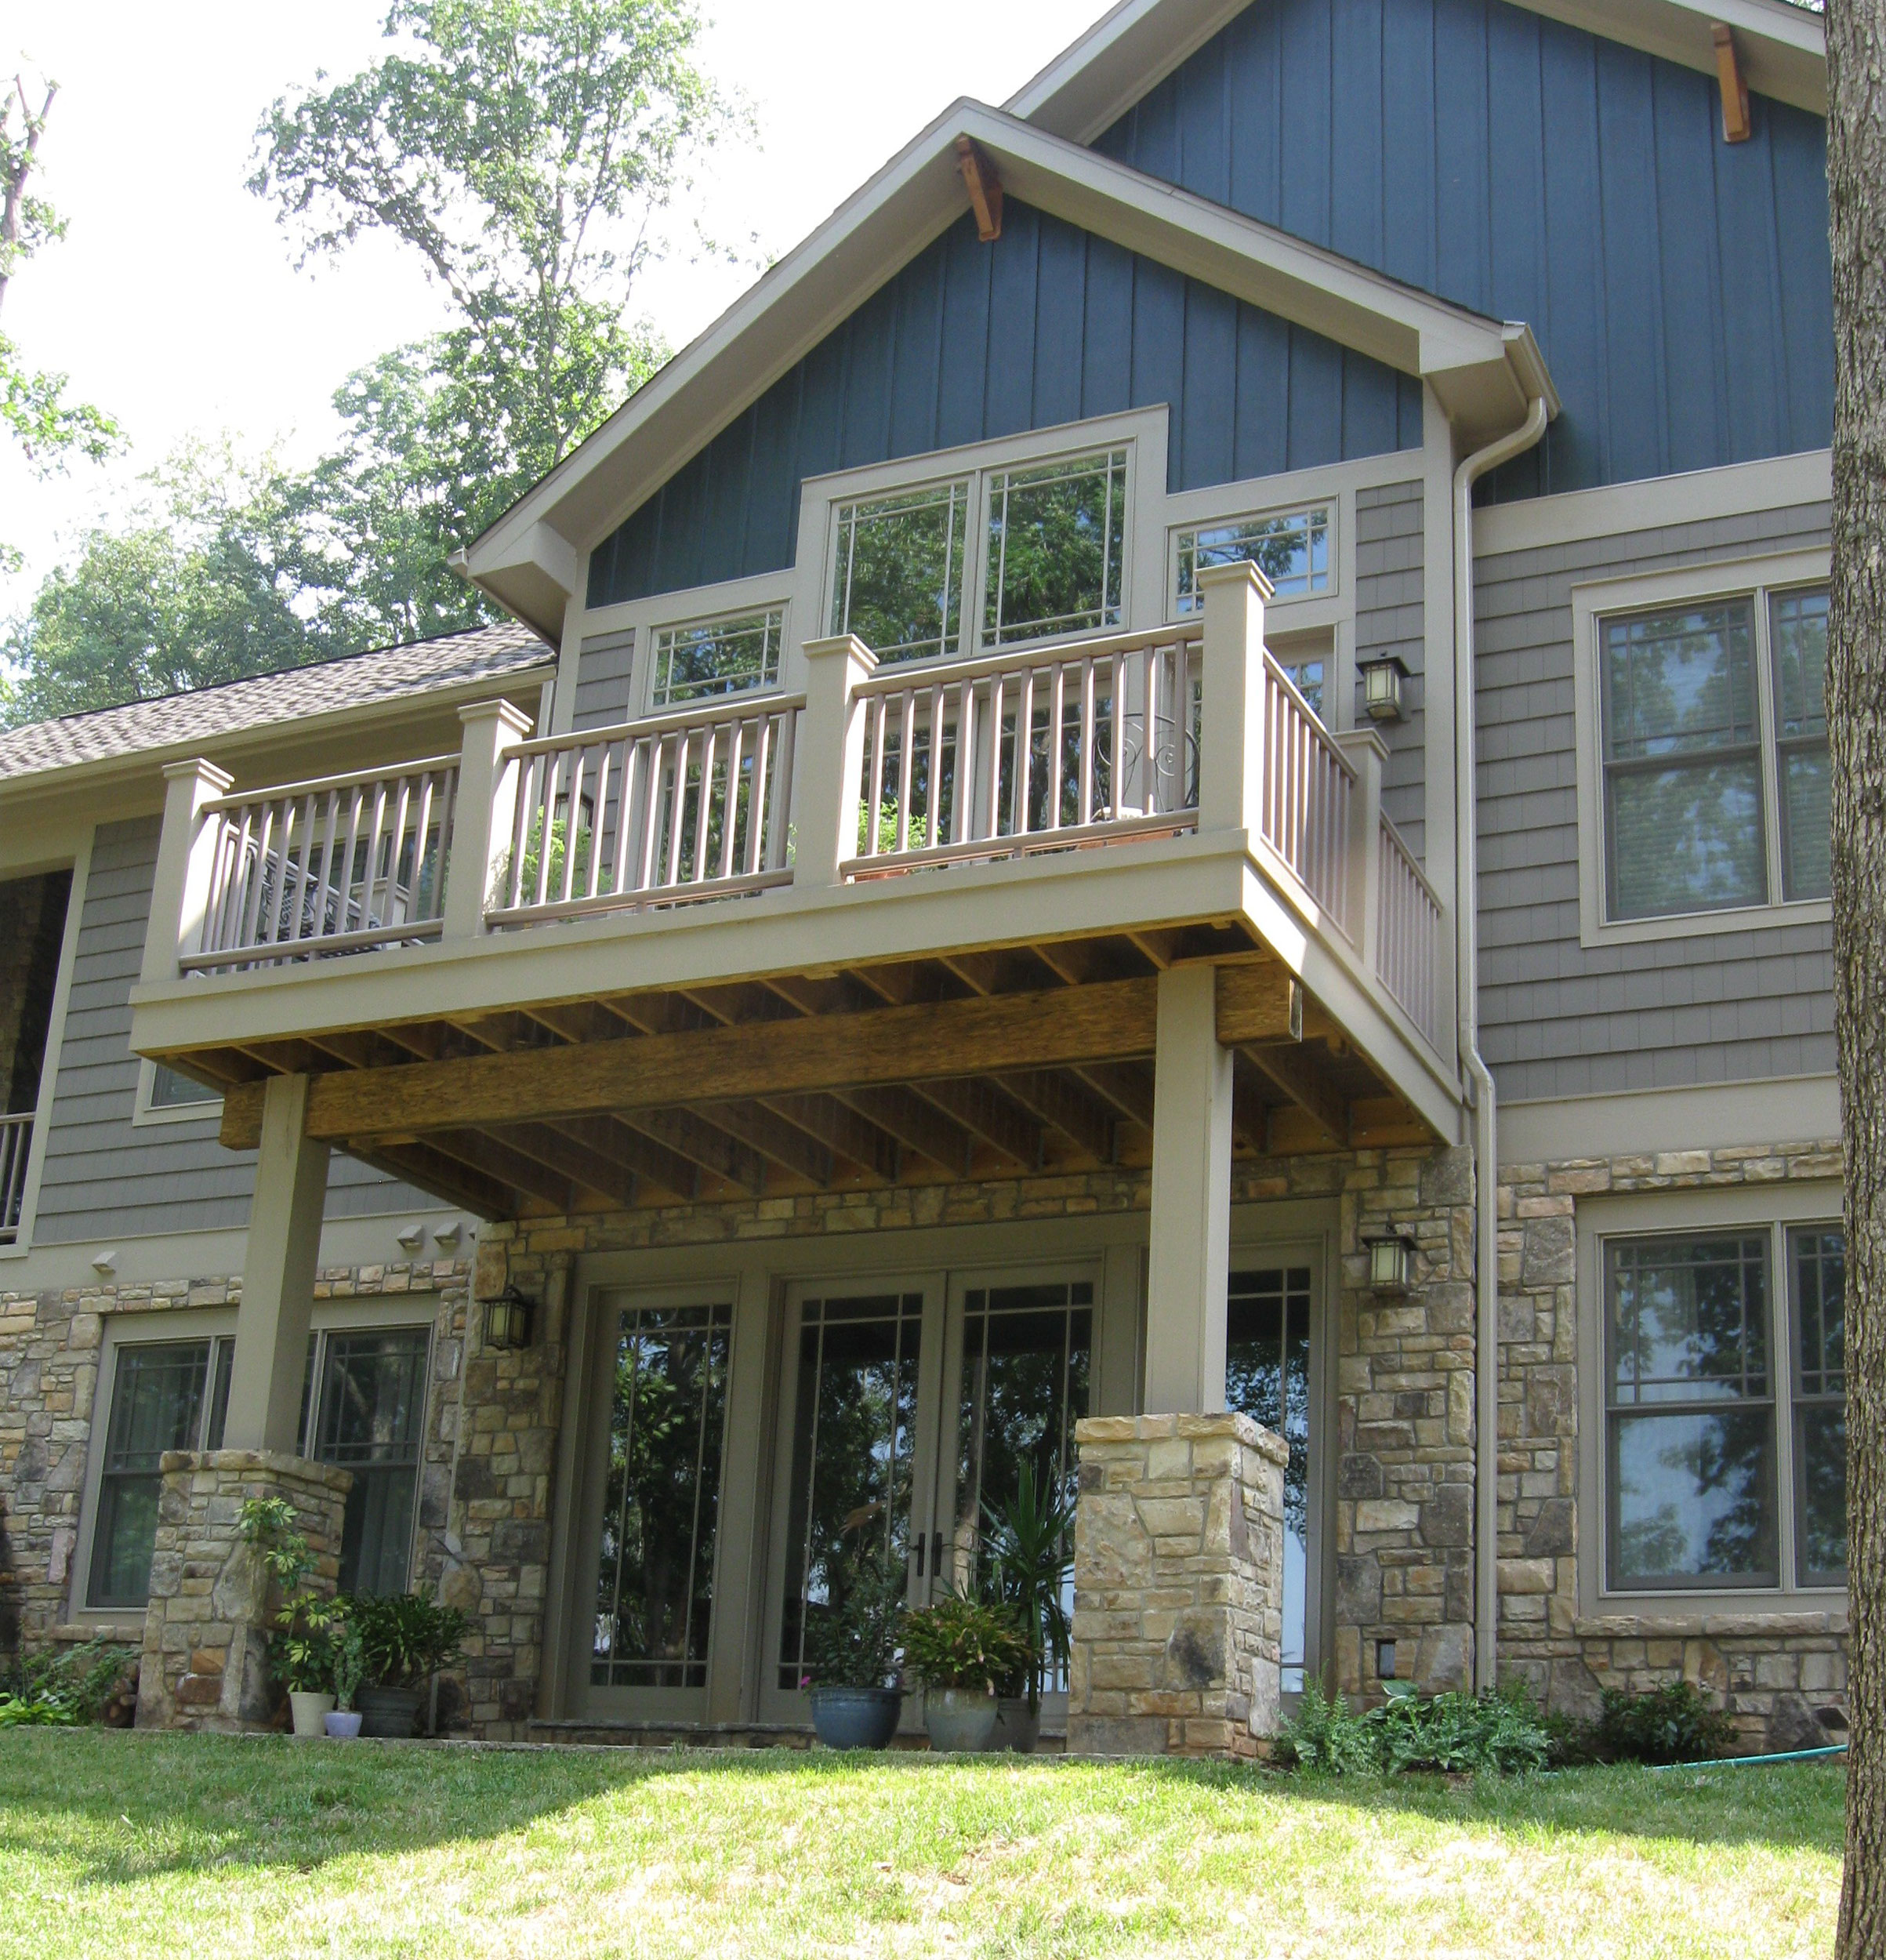 asheville-craftsman-dream-home--balcony.jpg